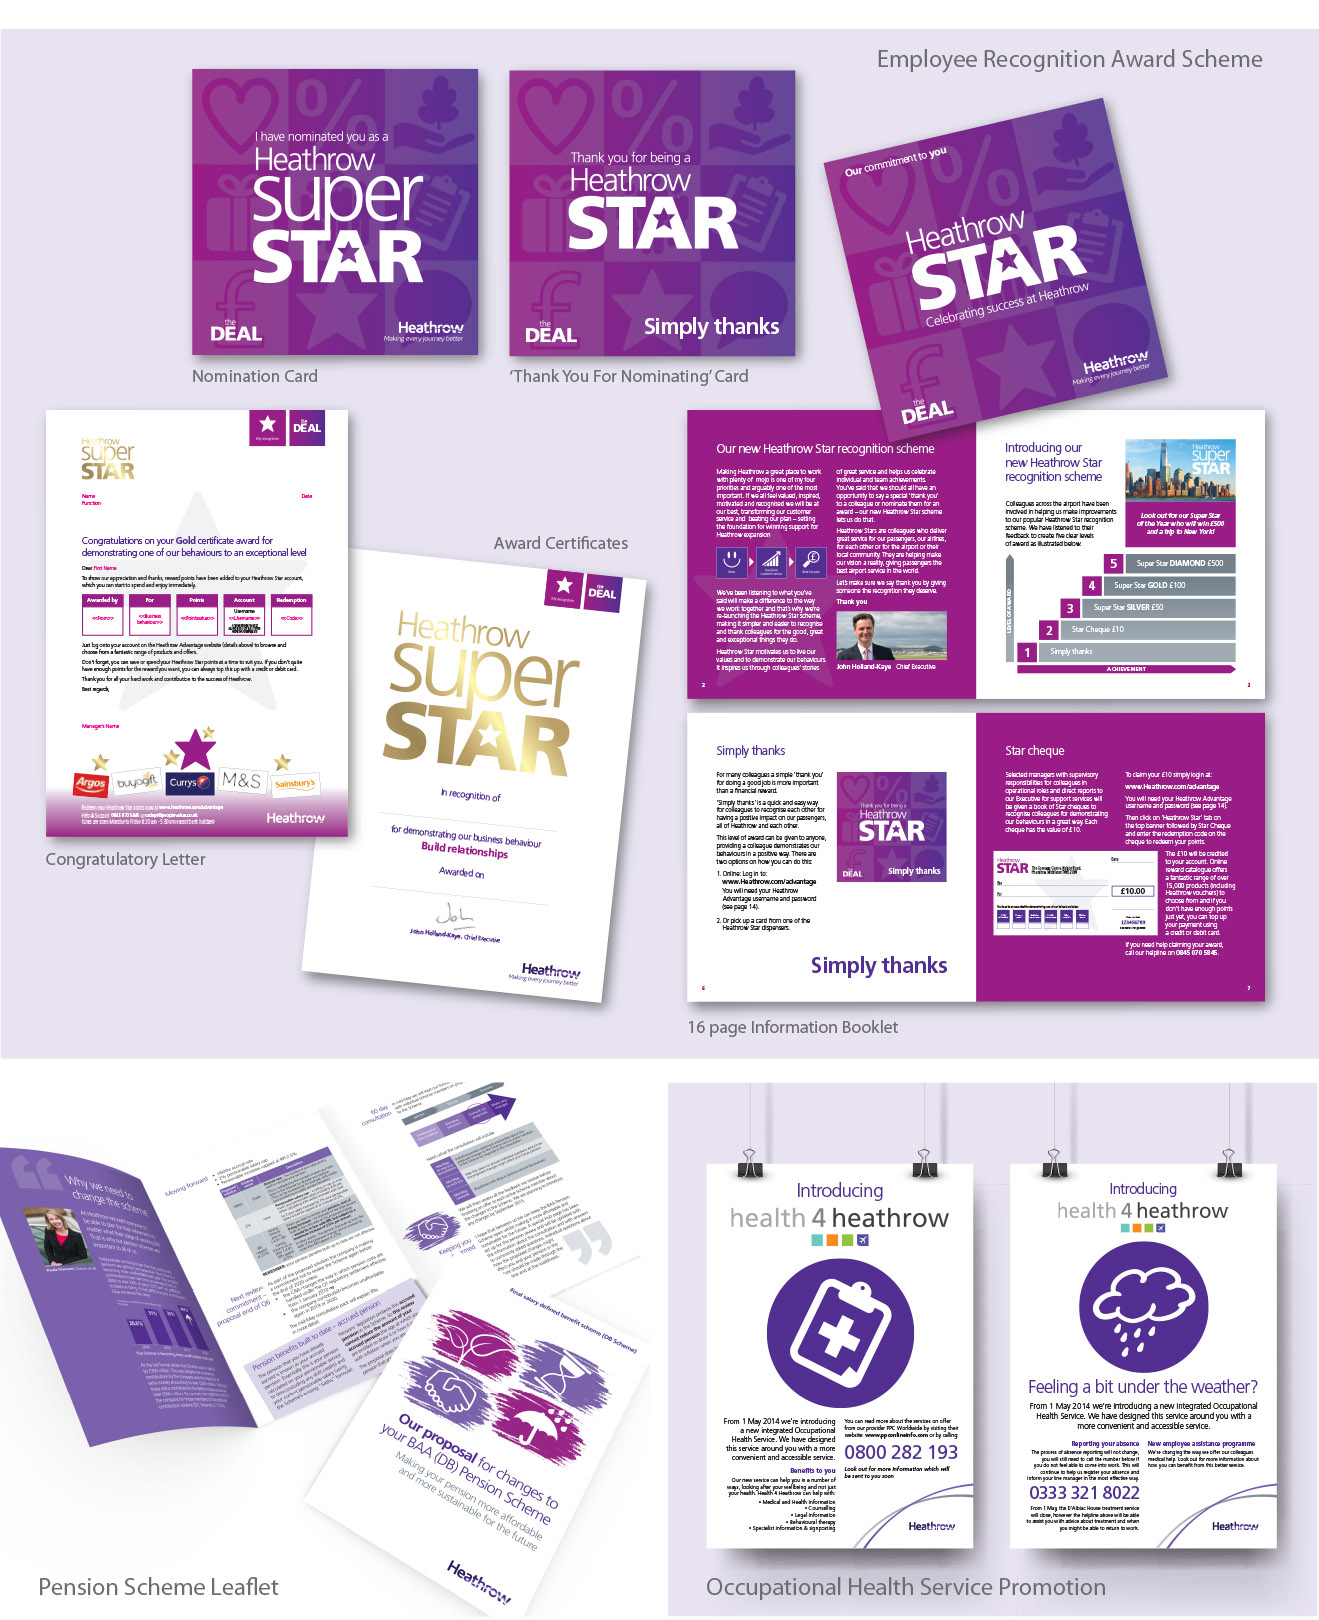 Example of internal comms showing the Heathrow Star award scheme